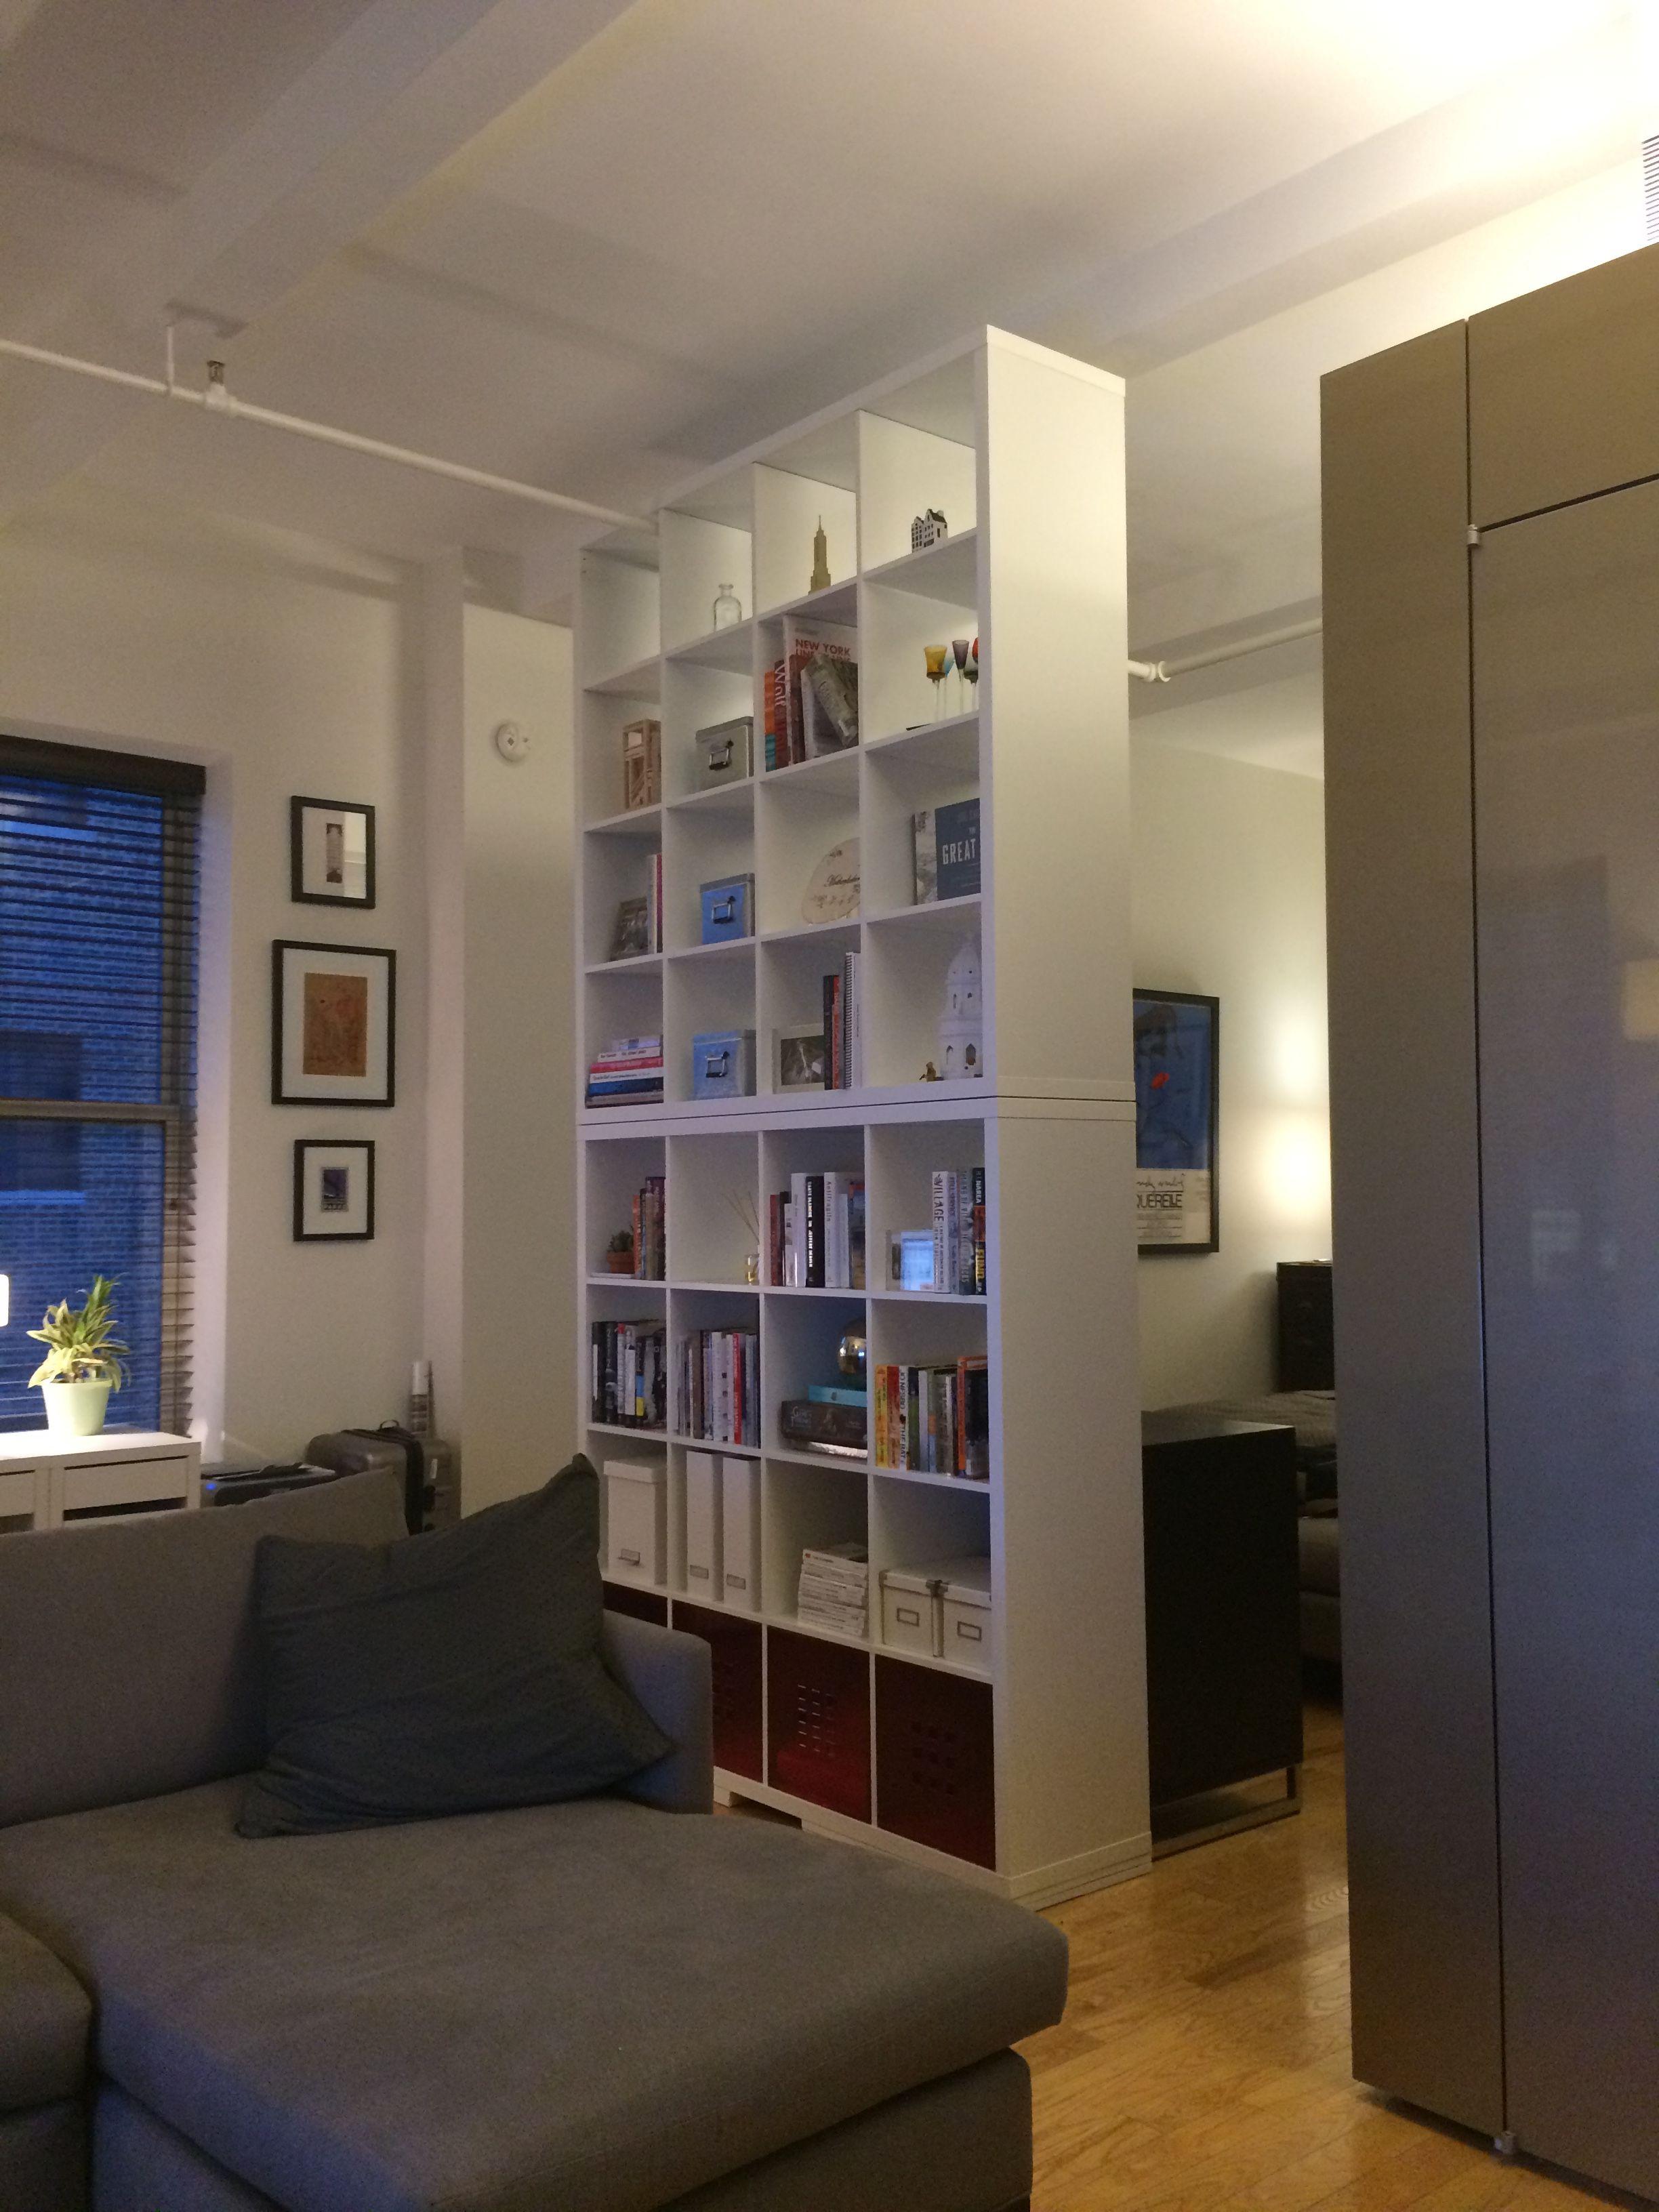 New Room Divider For Loft 2x Ikea Kallax Shelving Unit